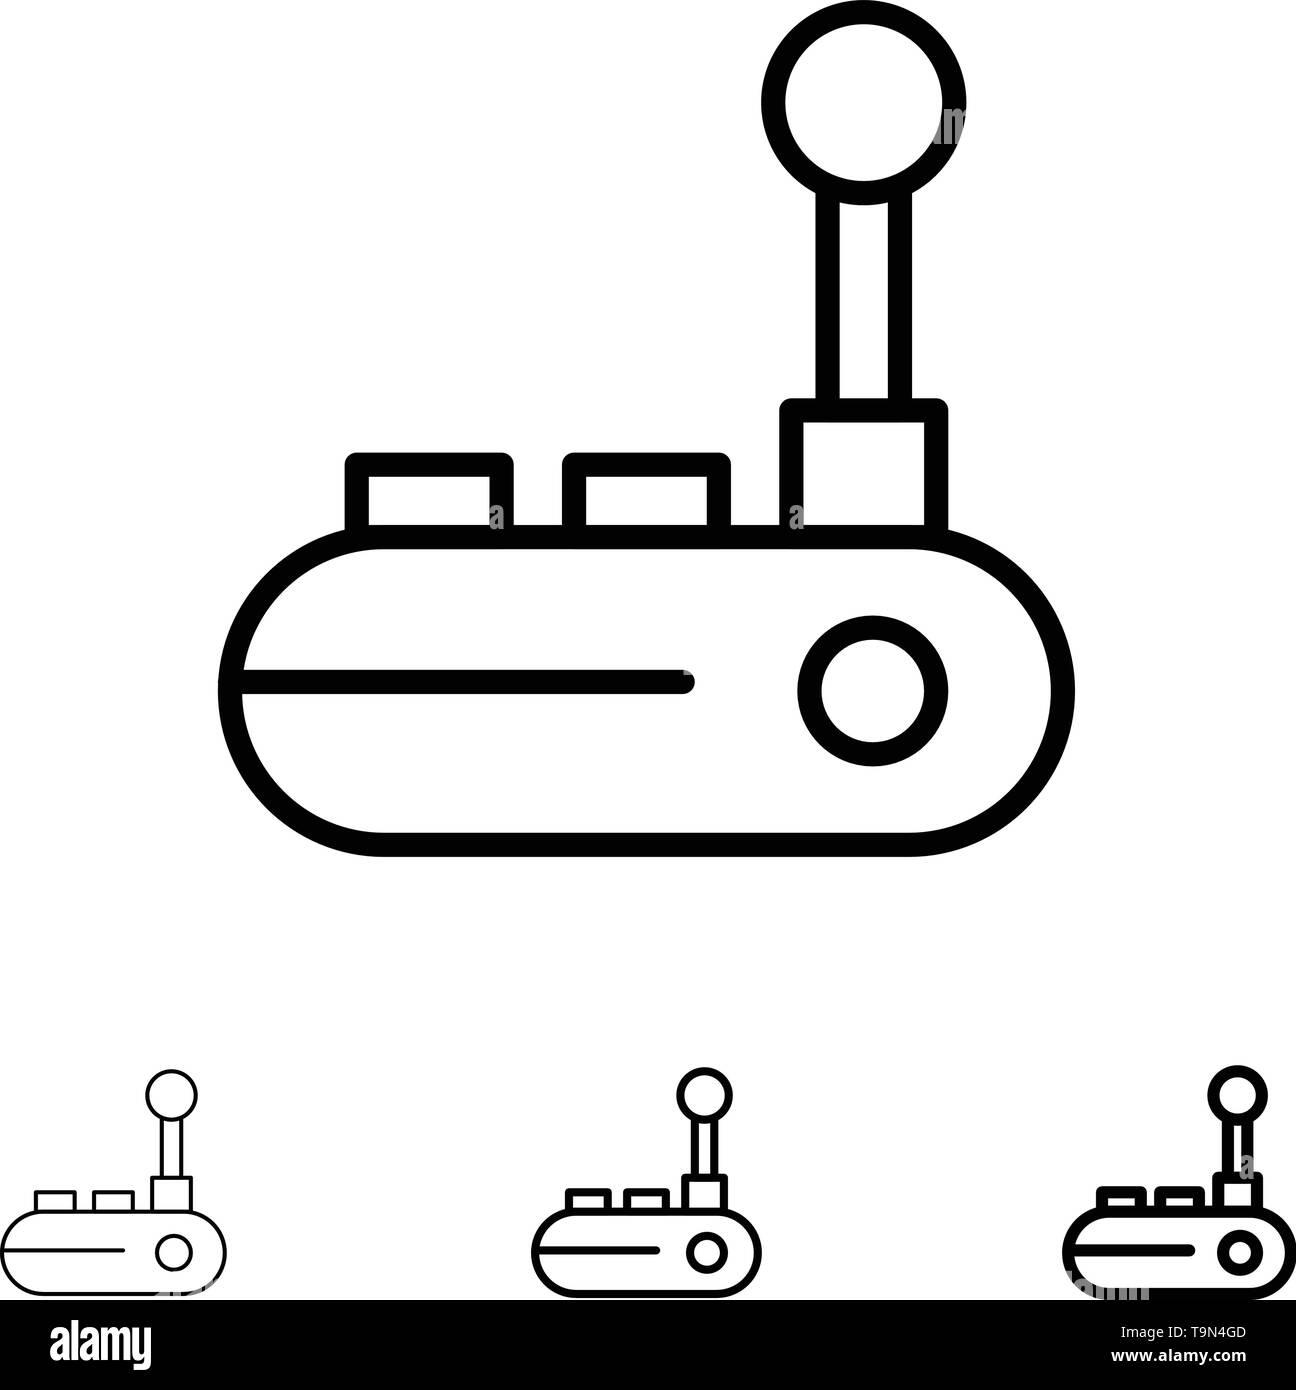 Controller, Joy Pad, Joy Stick, Joy pad Bold and thin black line icon set - Stock Image